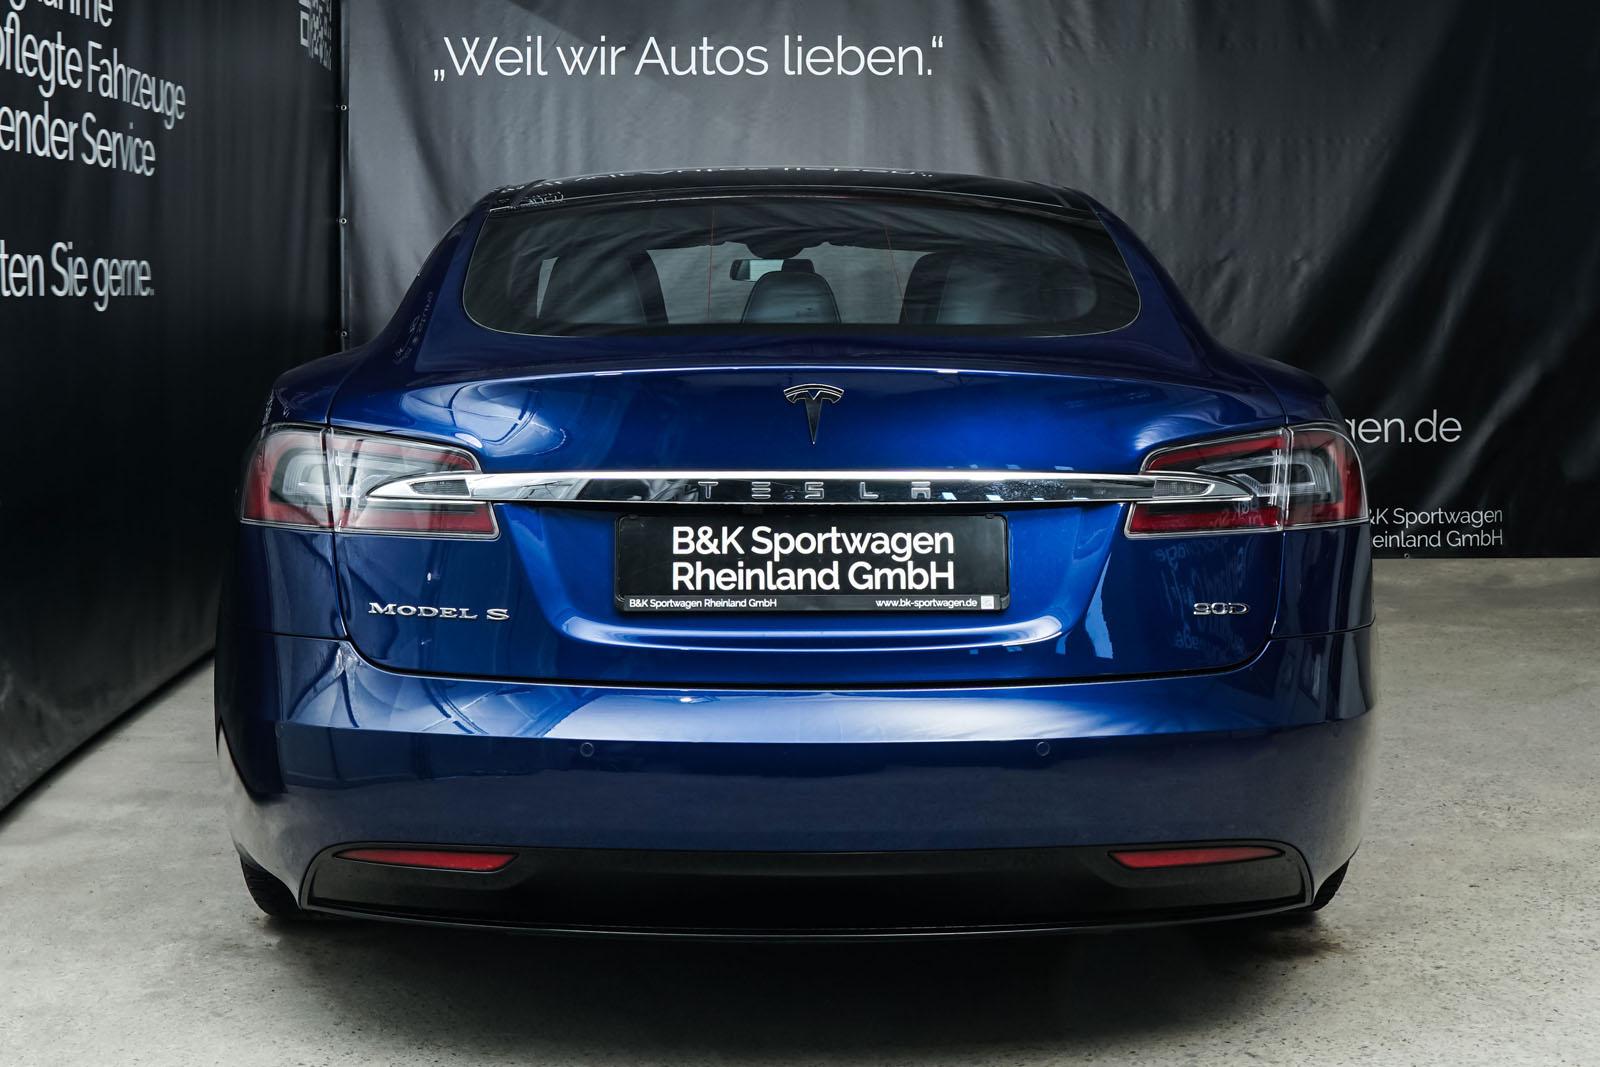 Tesla_ModelS_90D_Blau_Schwarz_Tes-0513_11_w